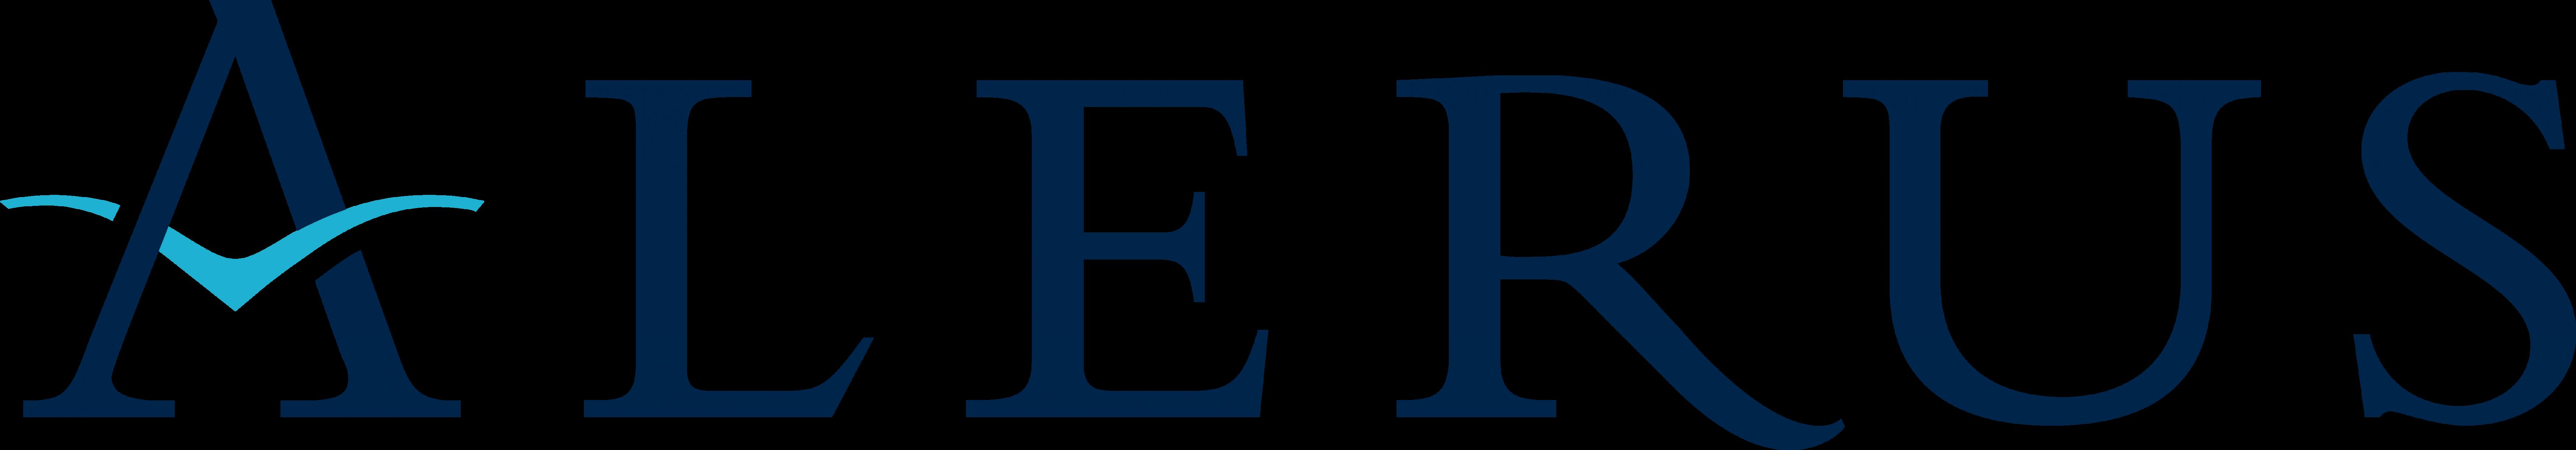 alerus-logo